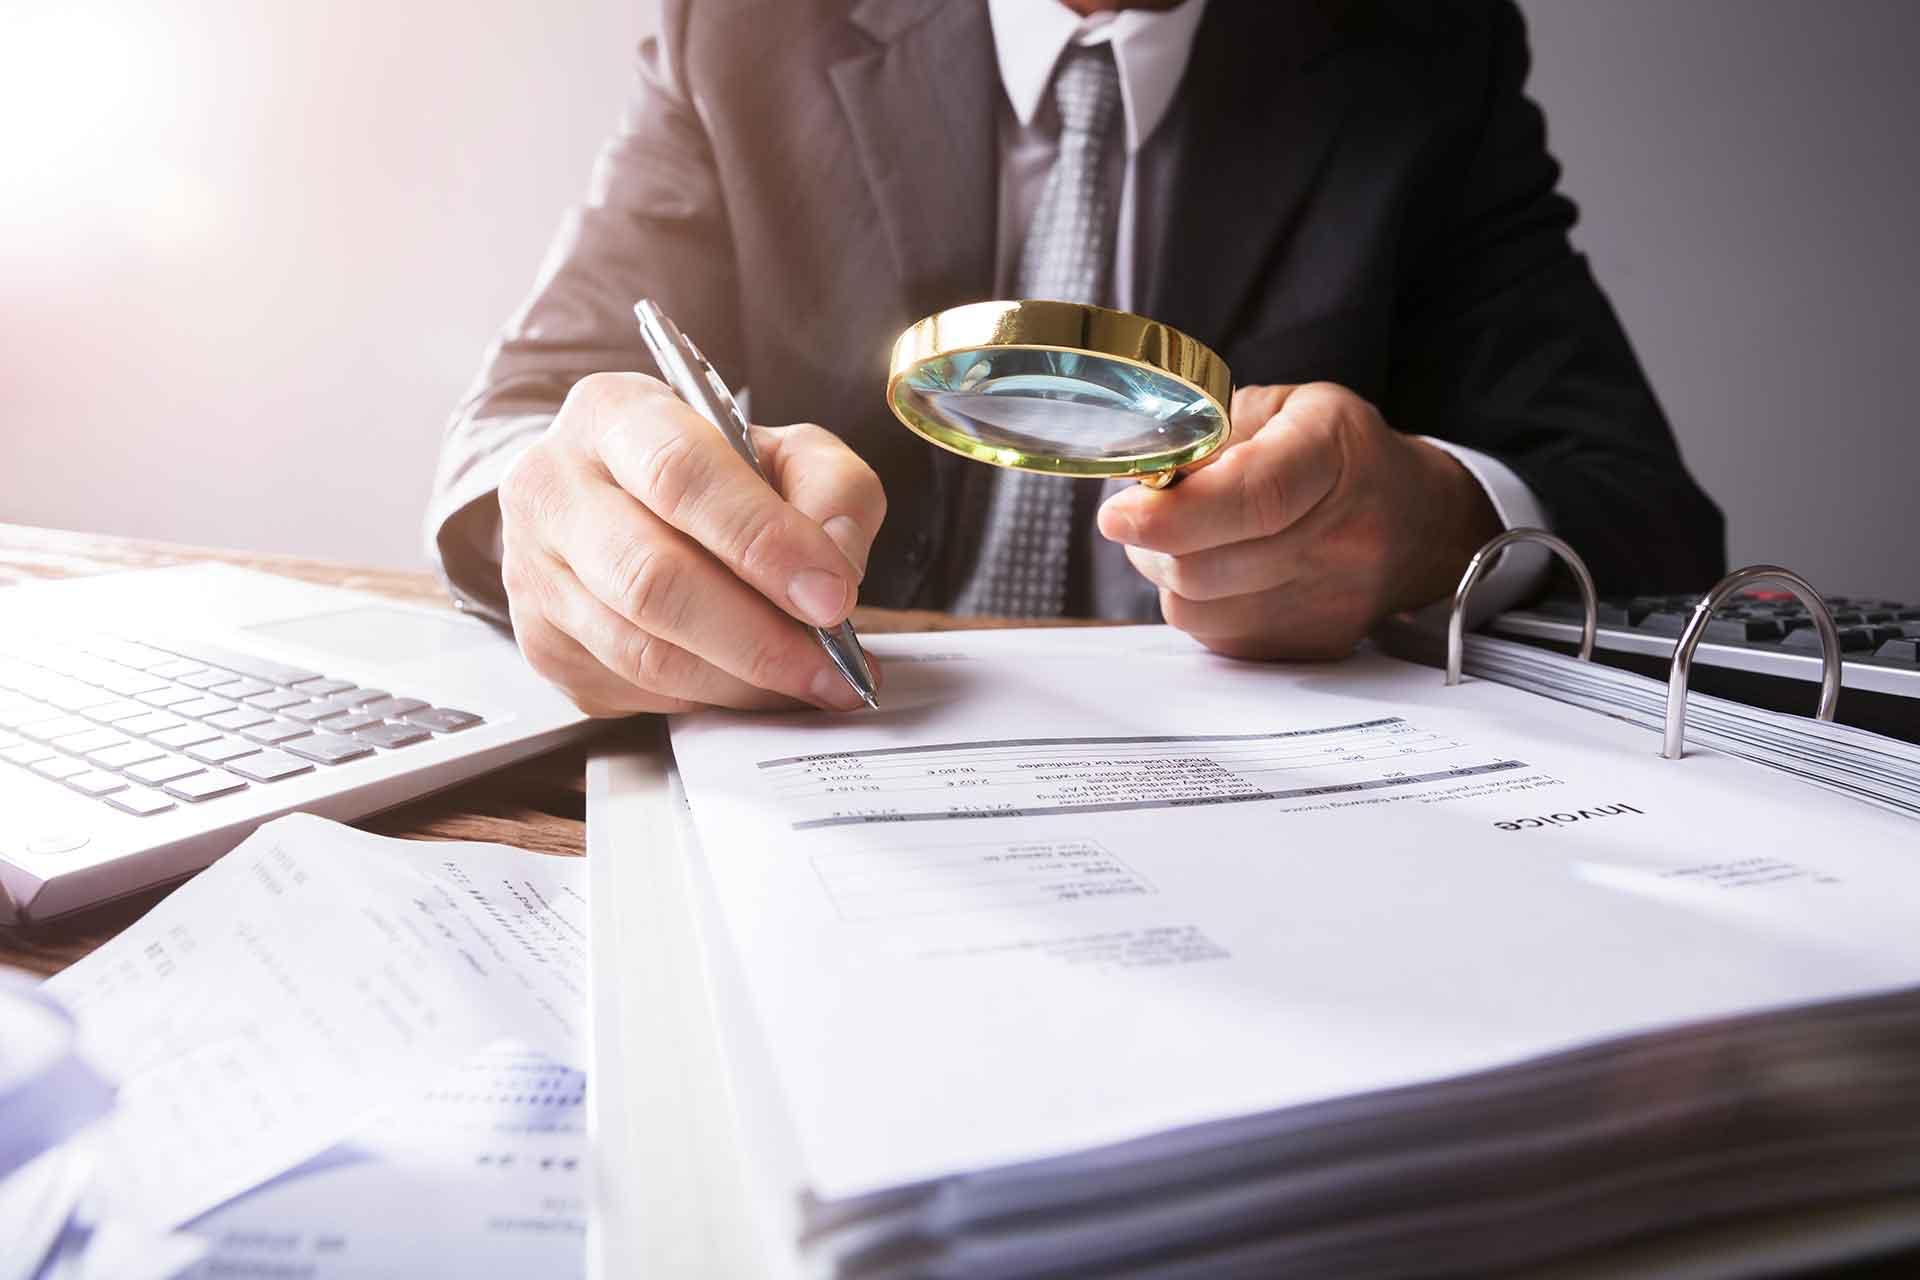 Fraude strafrecht advocaat - Weening Strafrechtadvocaten